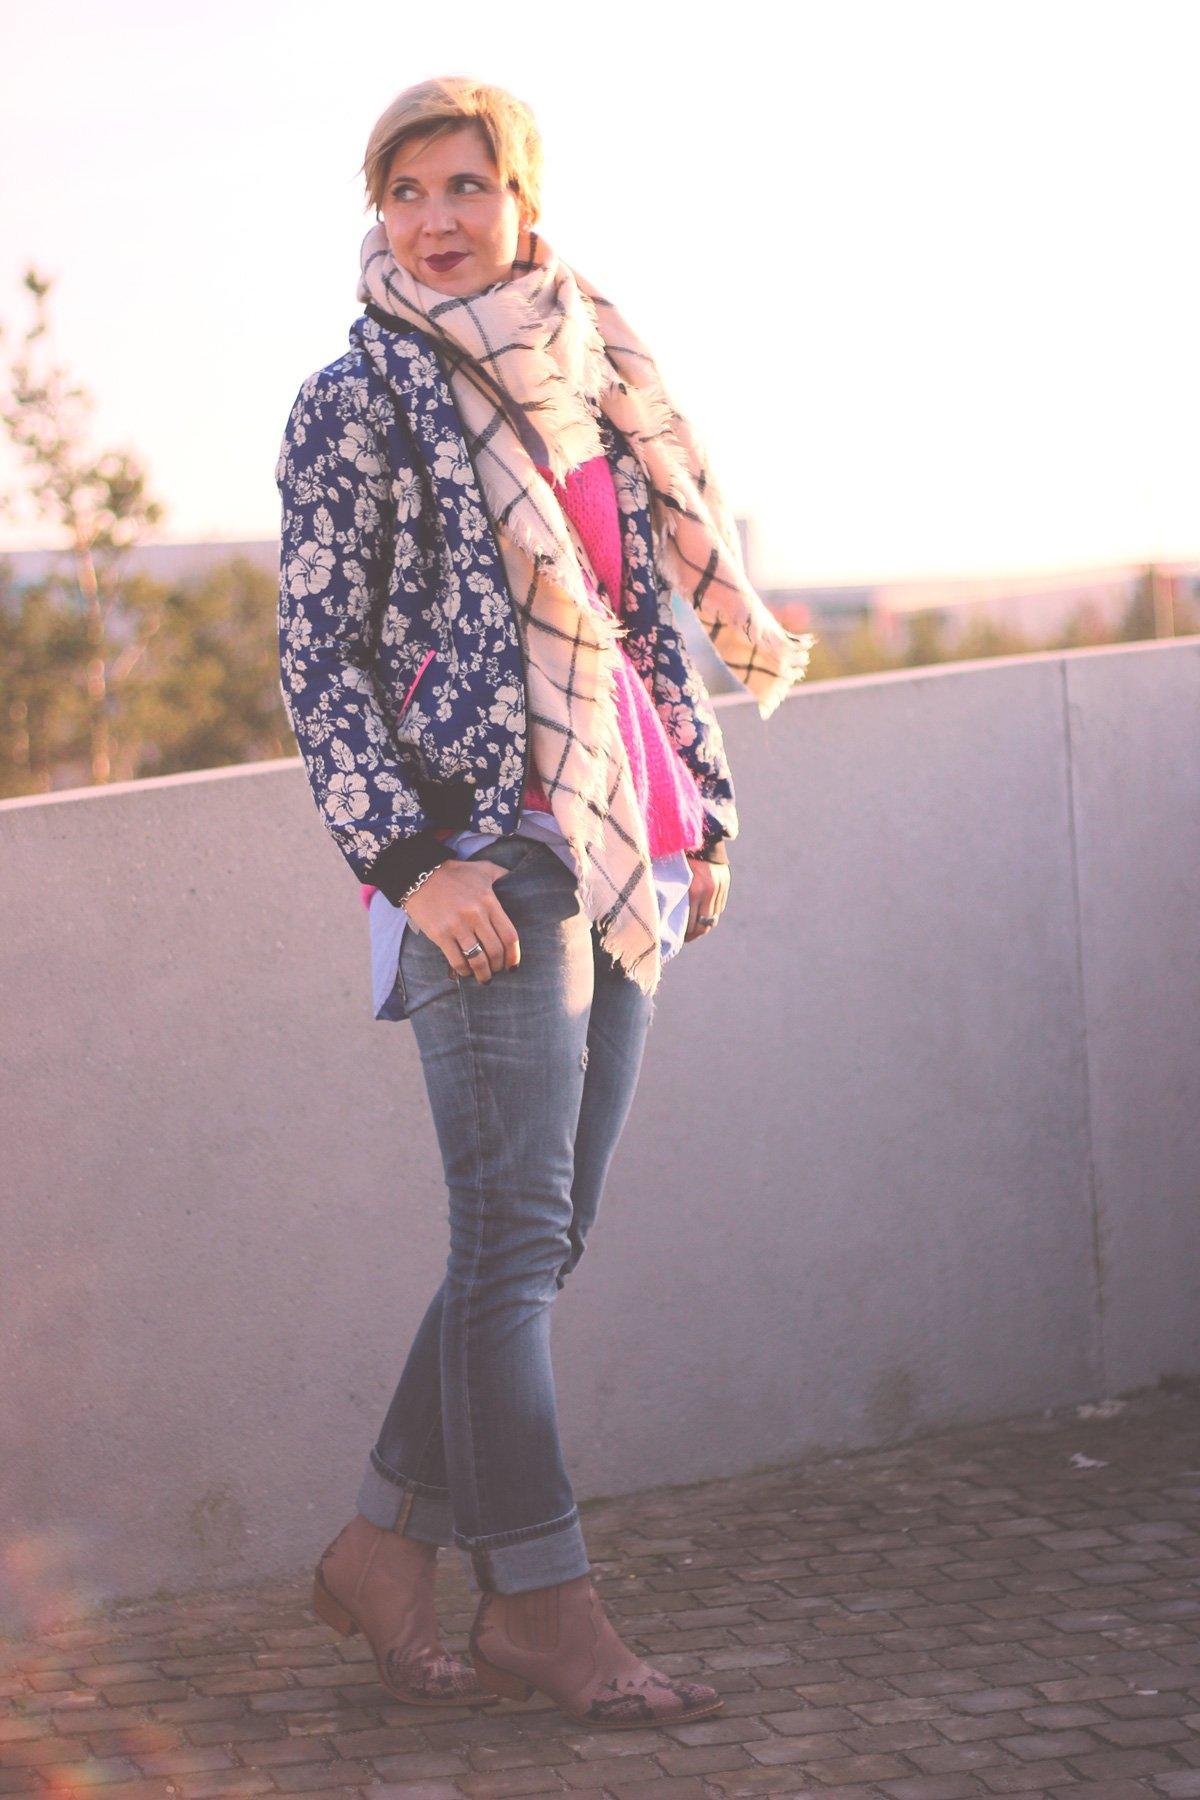 img_3539a-secretofstyle-dawanda-pink-grobstrick-oversize-pullover-vausschnitt-jeans-bluse-cowboystiefel